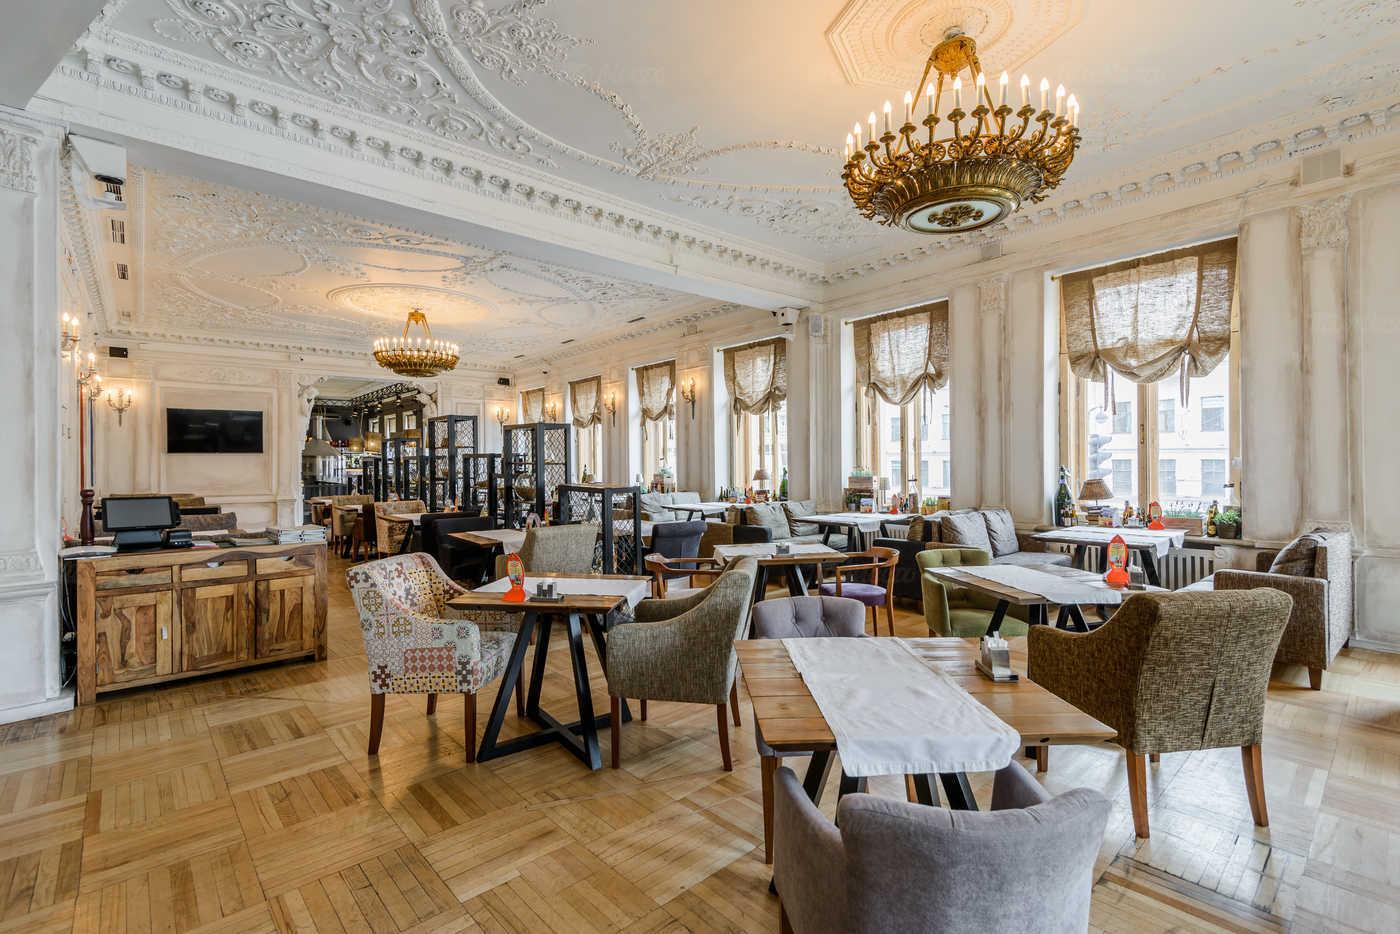 Ресторан Шато Винтаж (Chateau Vintage) на Невском проспекте фото 15